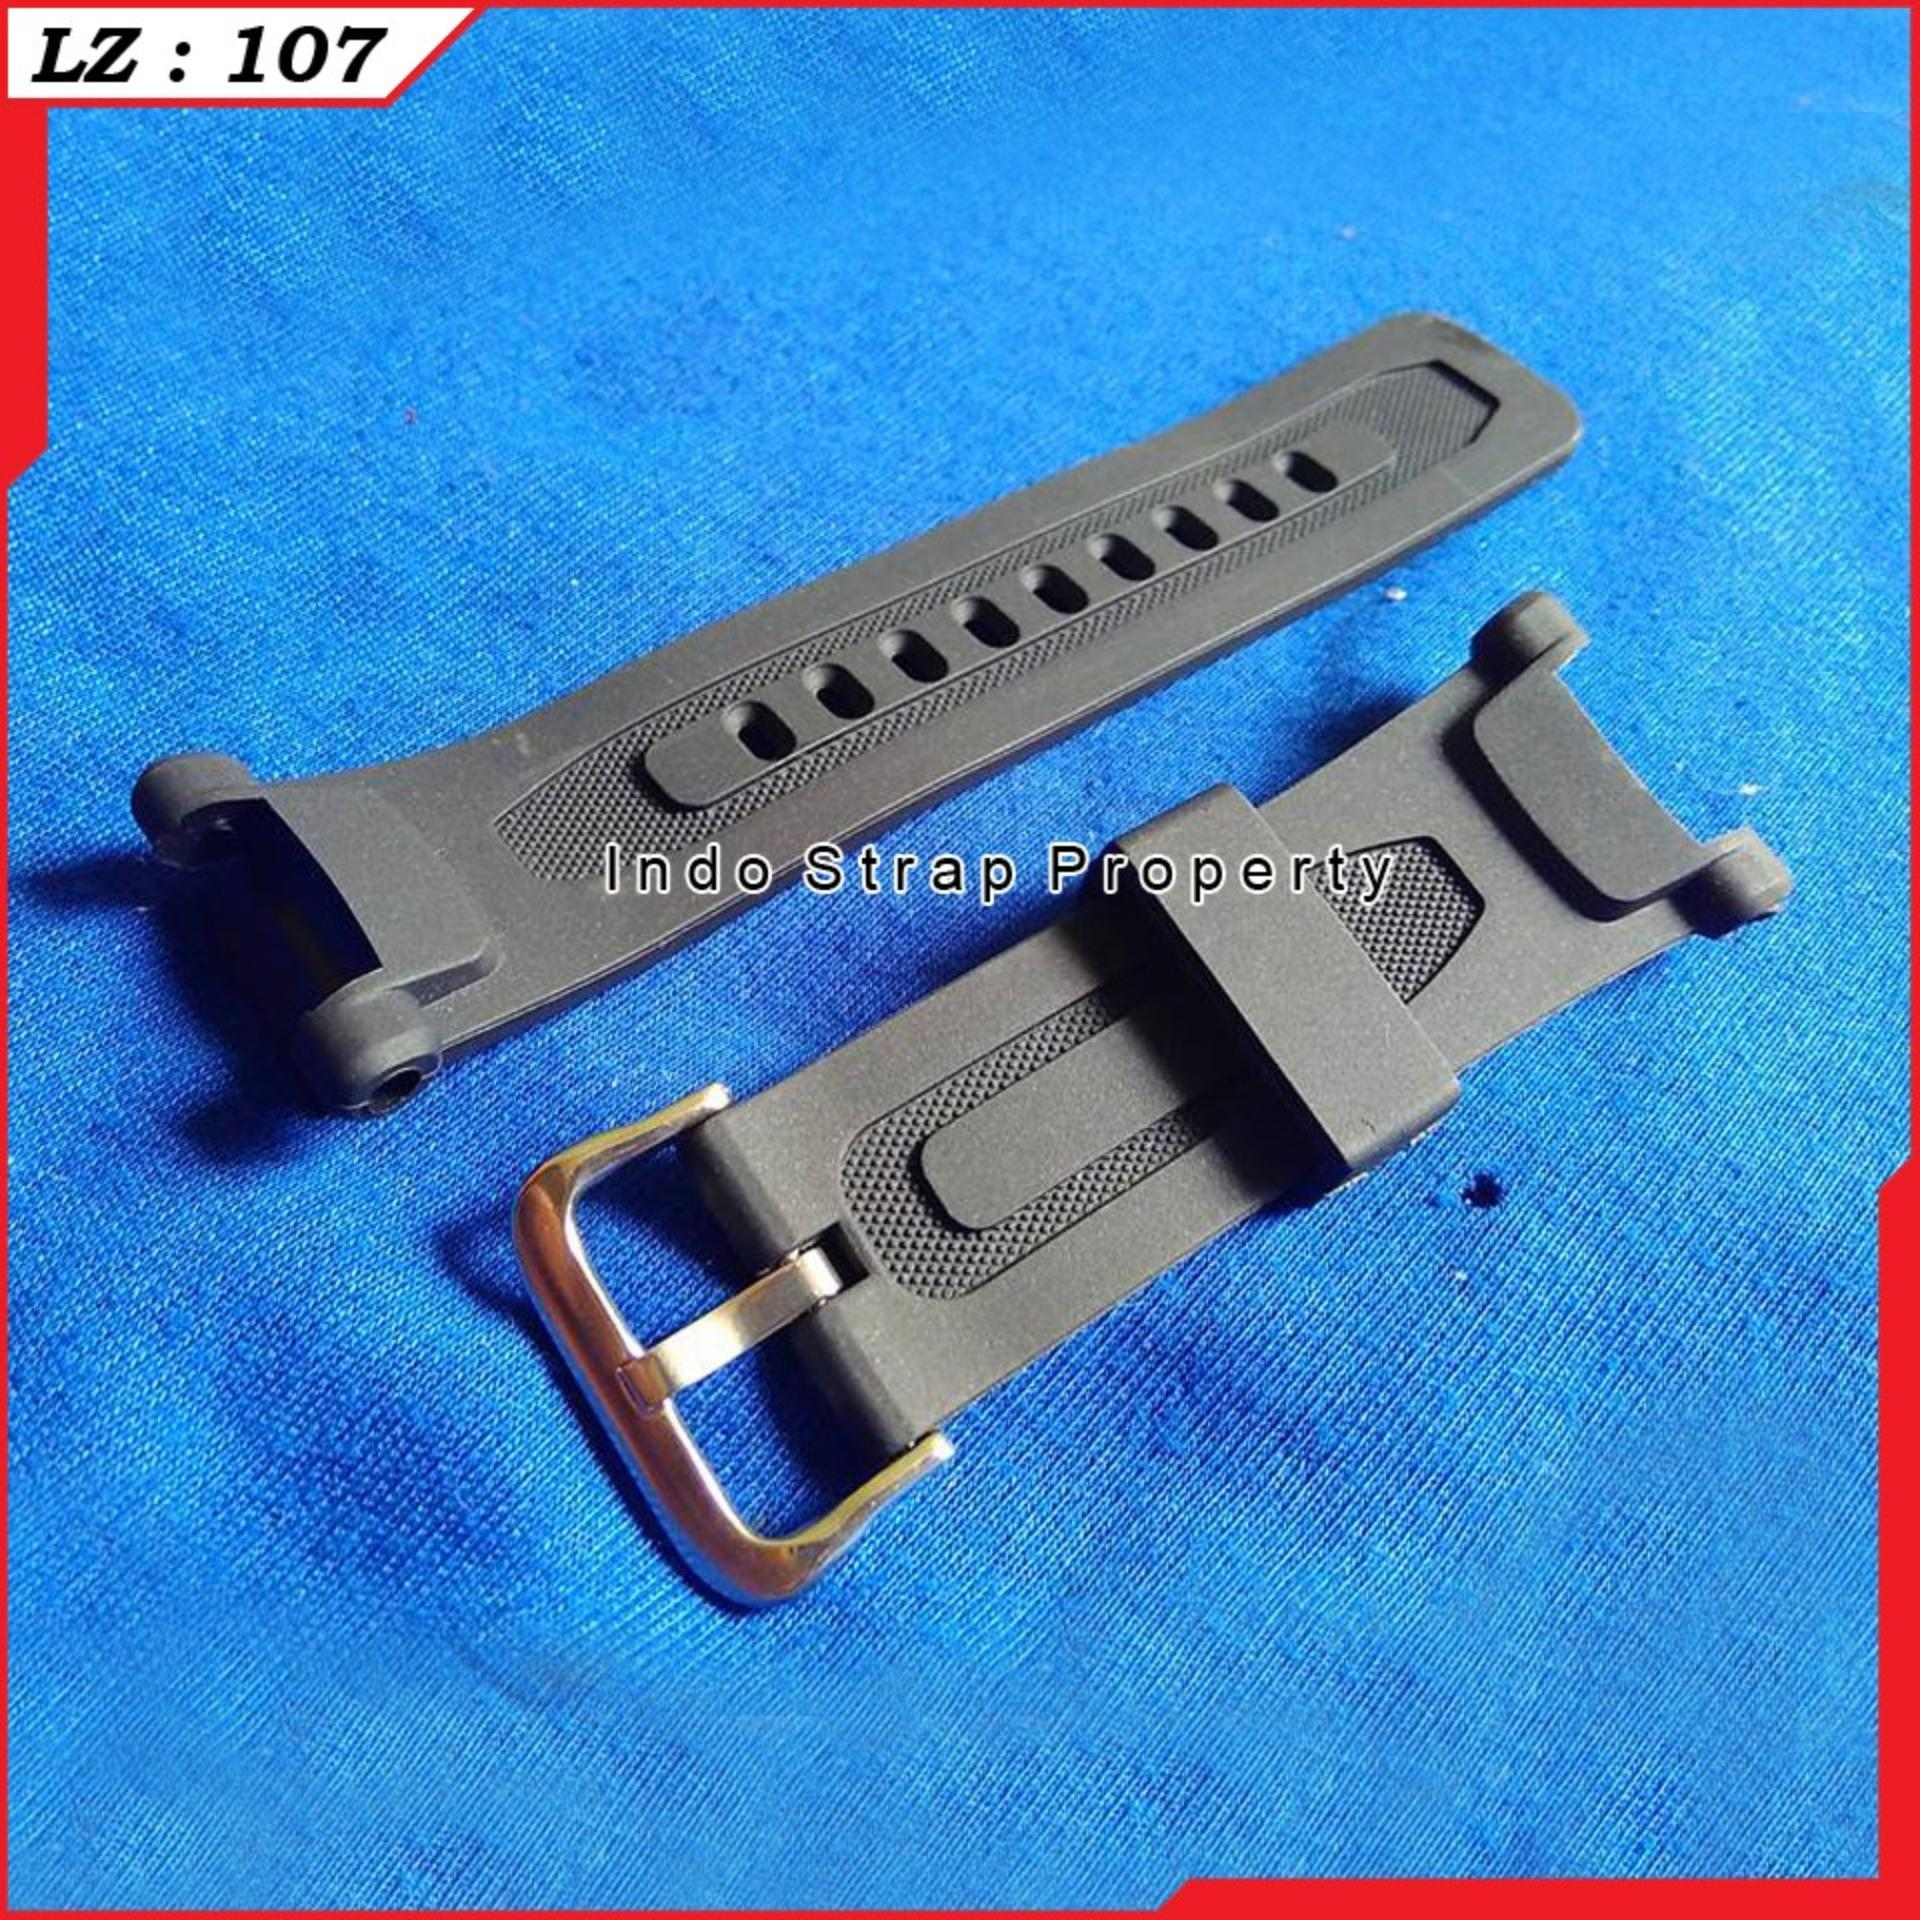 Beli Casio Protrek Prg 550 Store Marwanto606 280 2 Original Strap Pro Trek 240